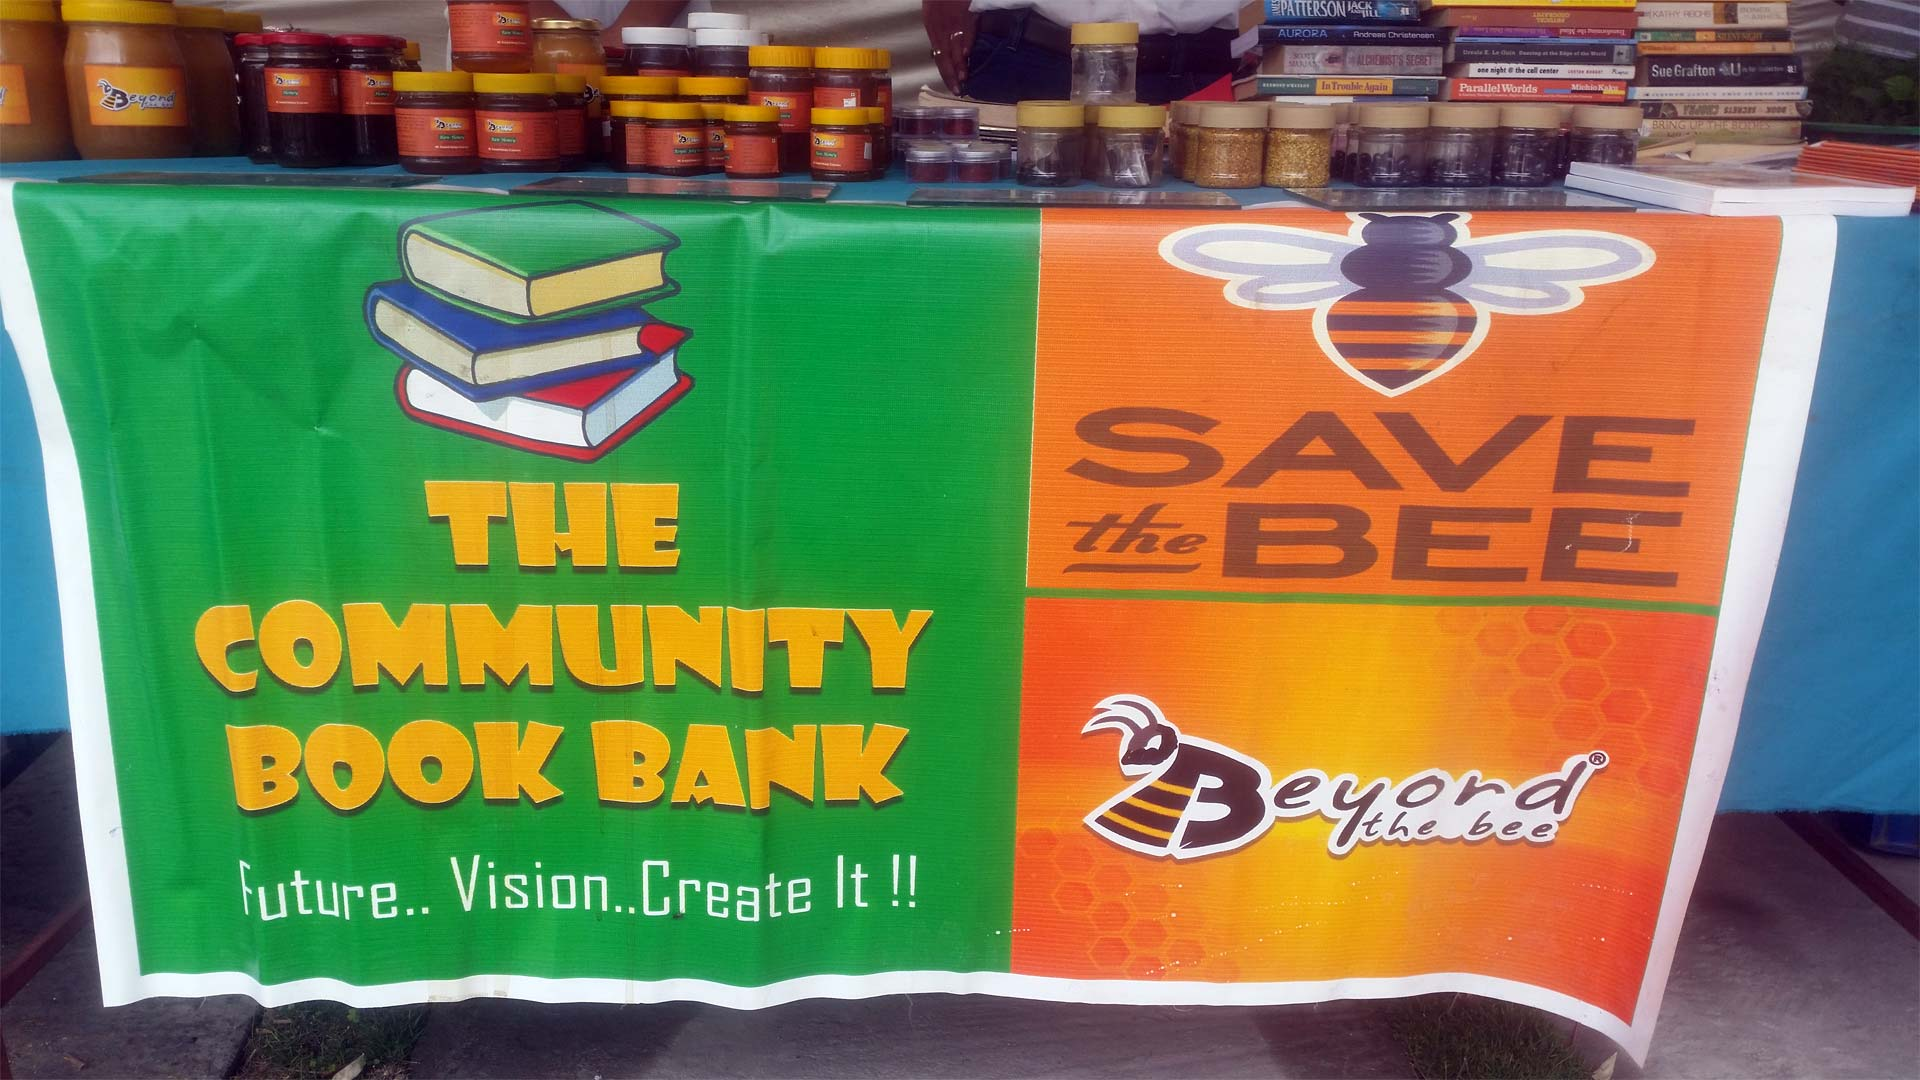 Sell-Honey-Organic-Farmers market